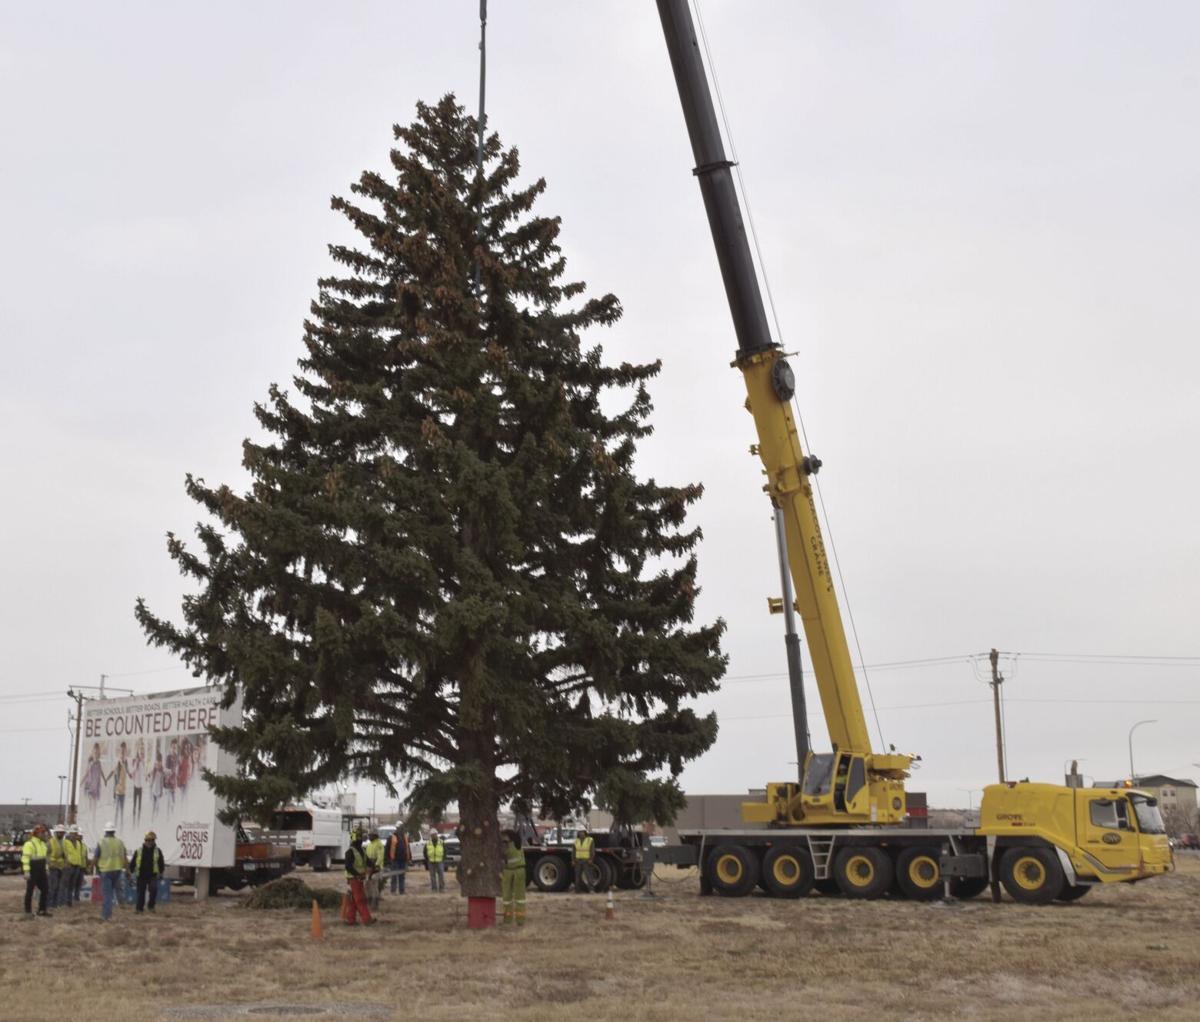 Tree-mendous installation